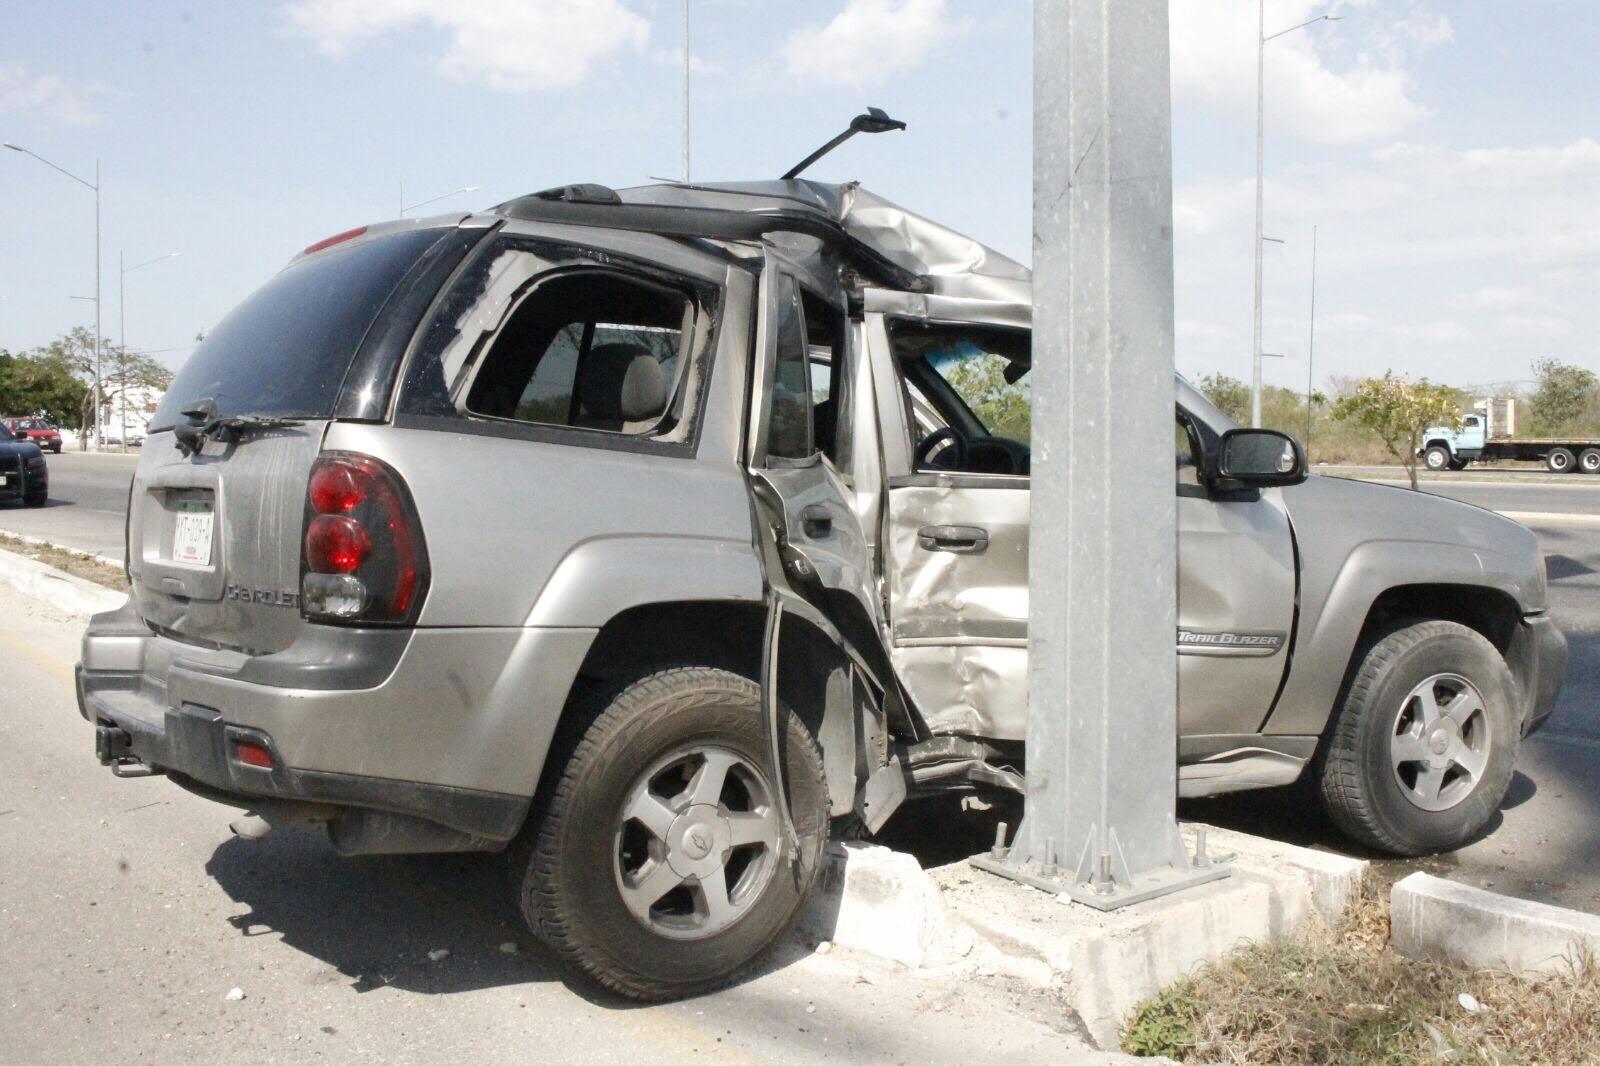 Menor prensado tras choque en periférico de Mérida